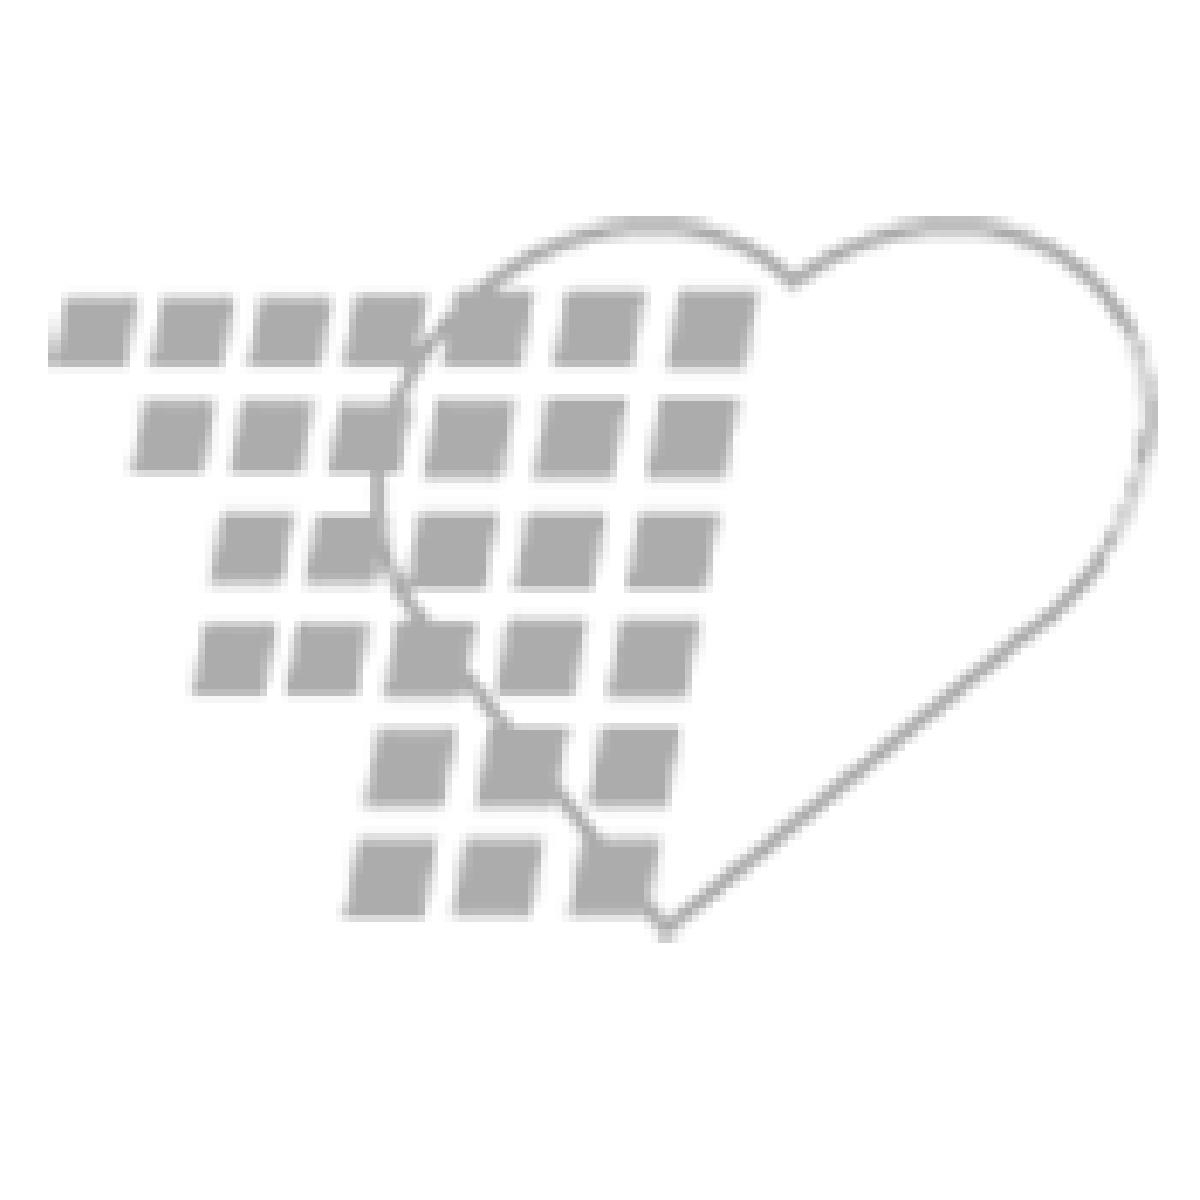 06-93-0071 - Demo Dose® Concert 27 mg - 100 Pills/Bottle